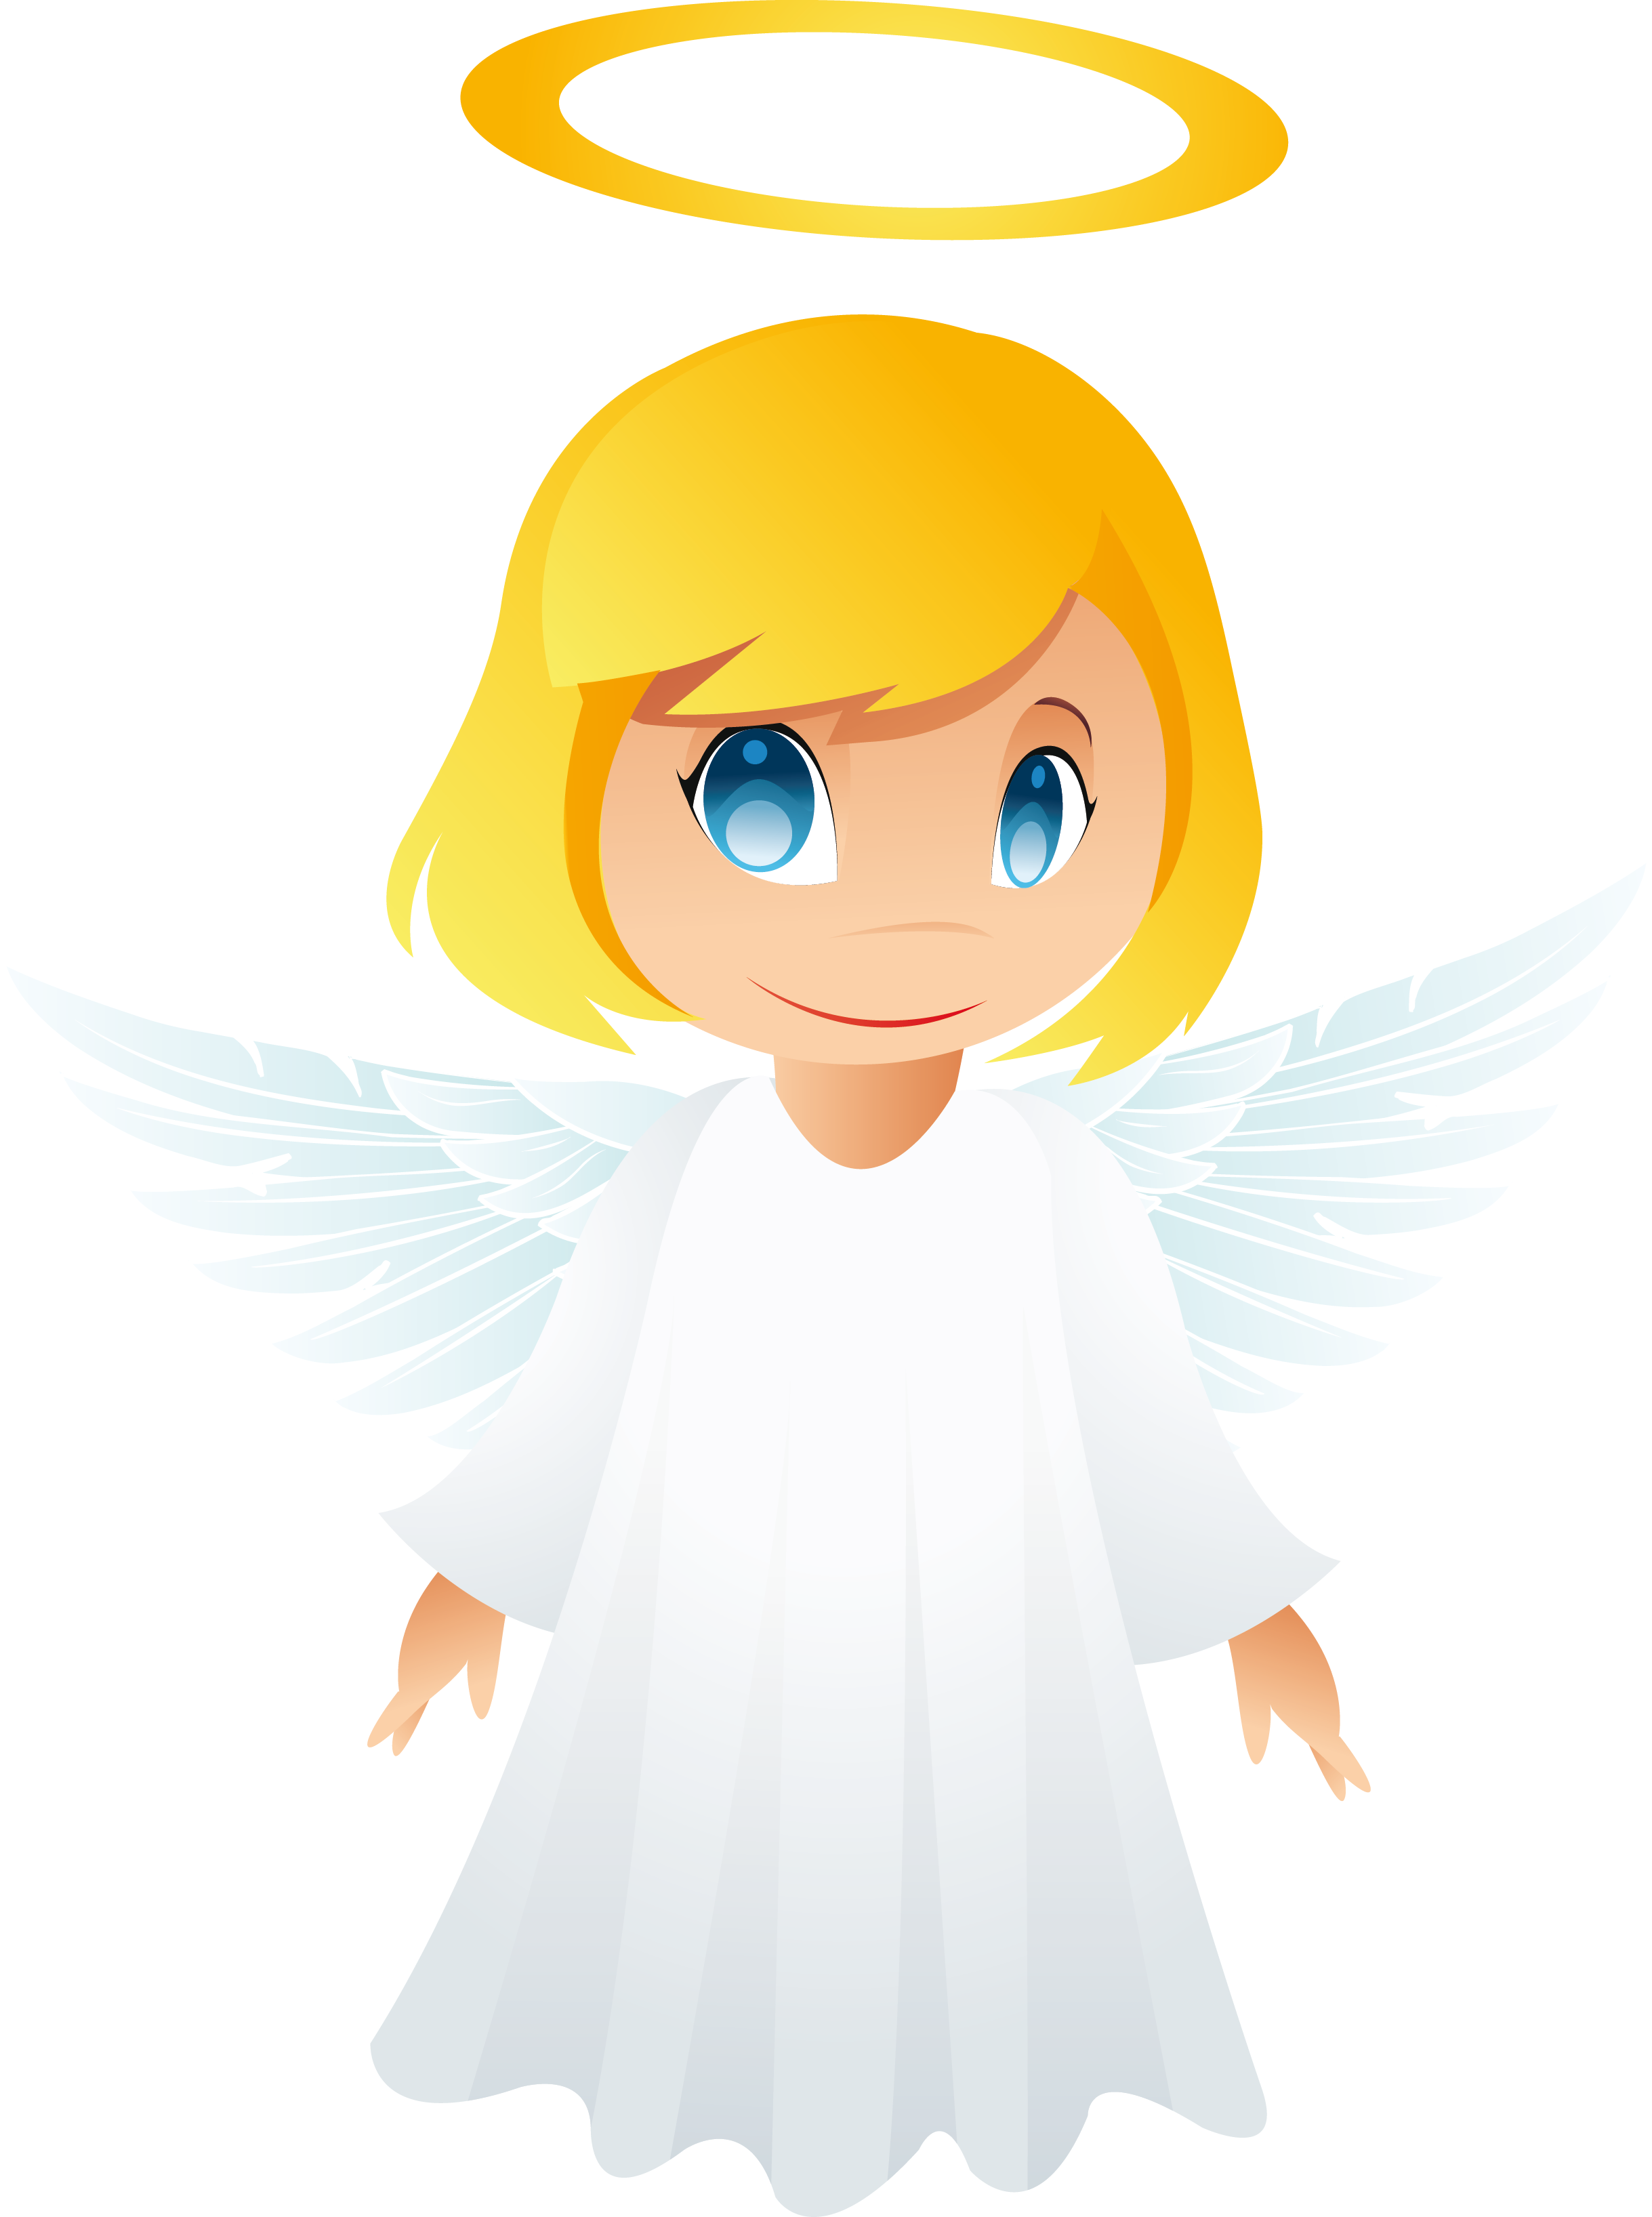 Angel clipart free graphics of cherubs a-Angel clipart free graphics of cherubs and angels the cliparts-1